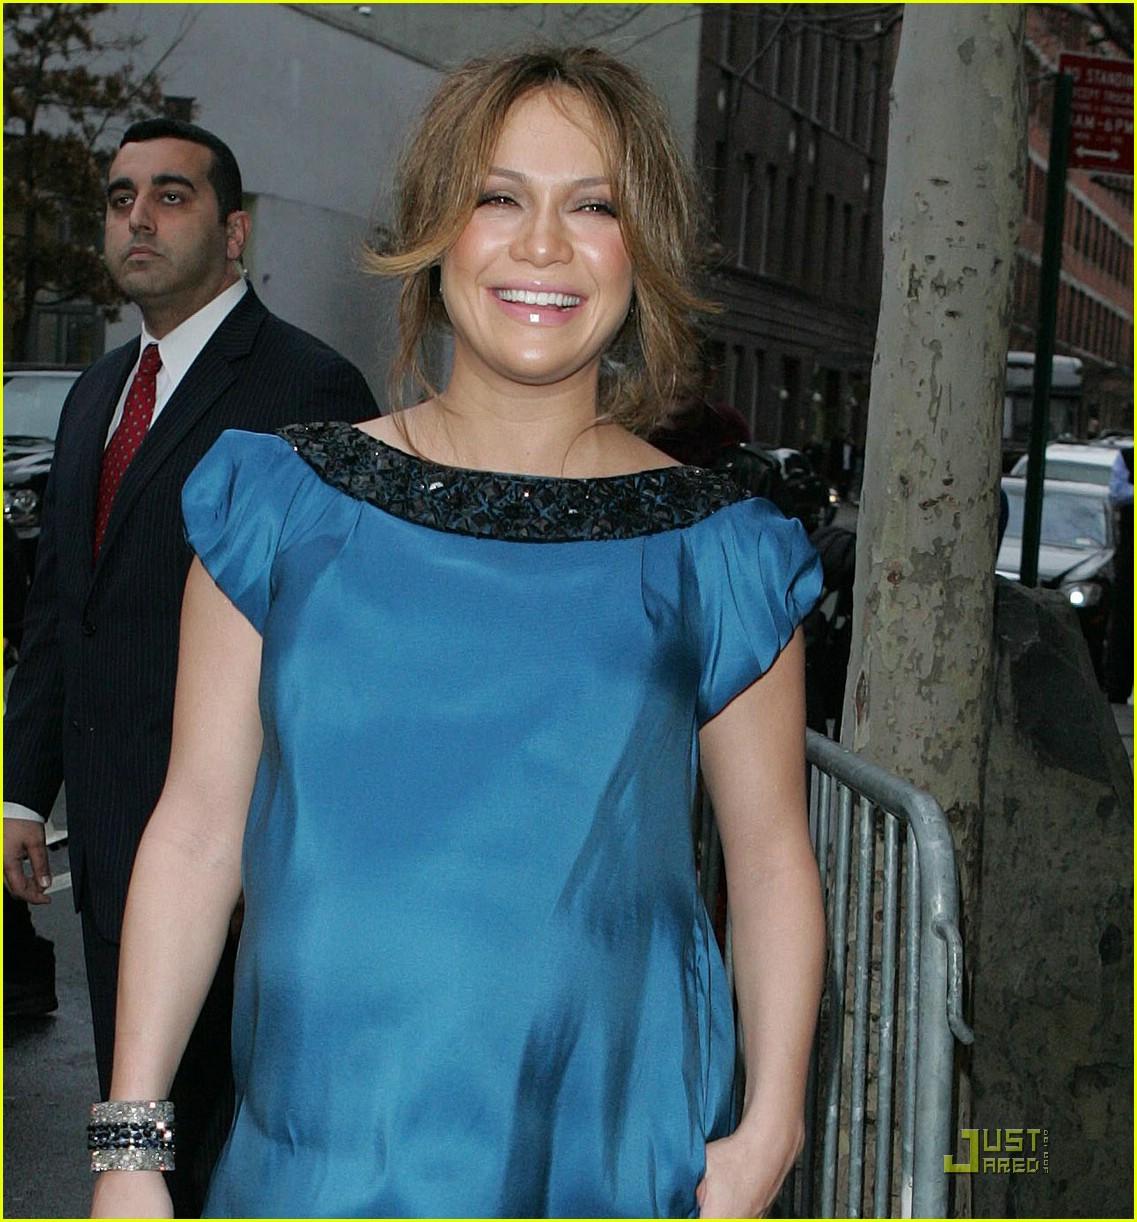 Logan Paul Reveals Why His New 1 Million Ranch Is: Jennifer Lopez @ NY Fashion Week: Photo 912761